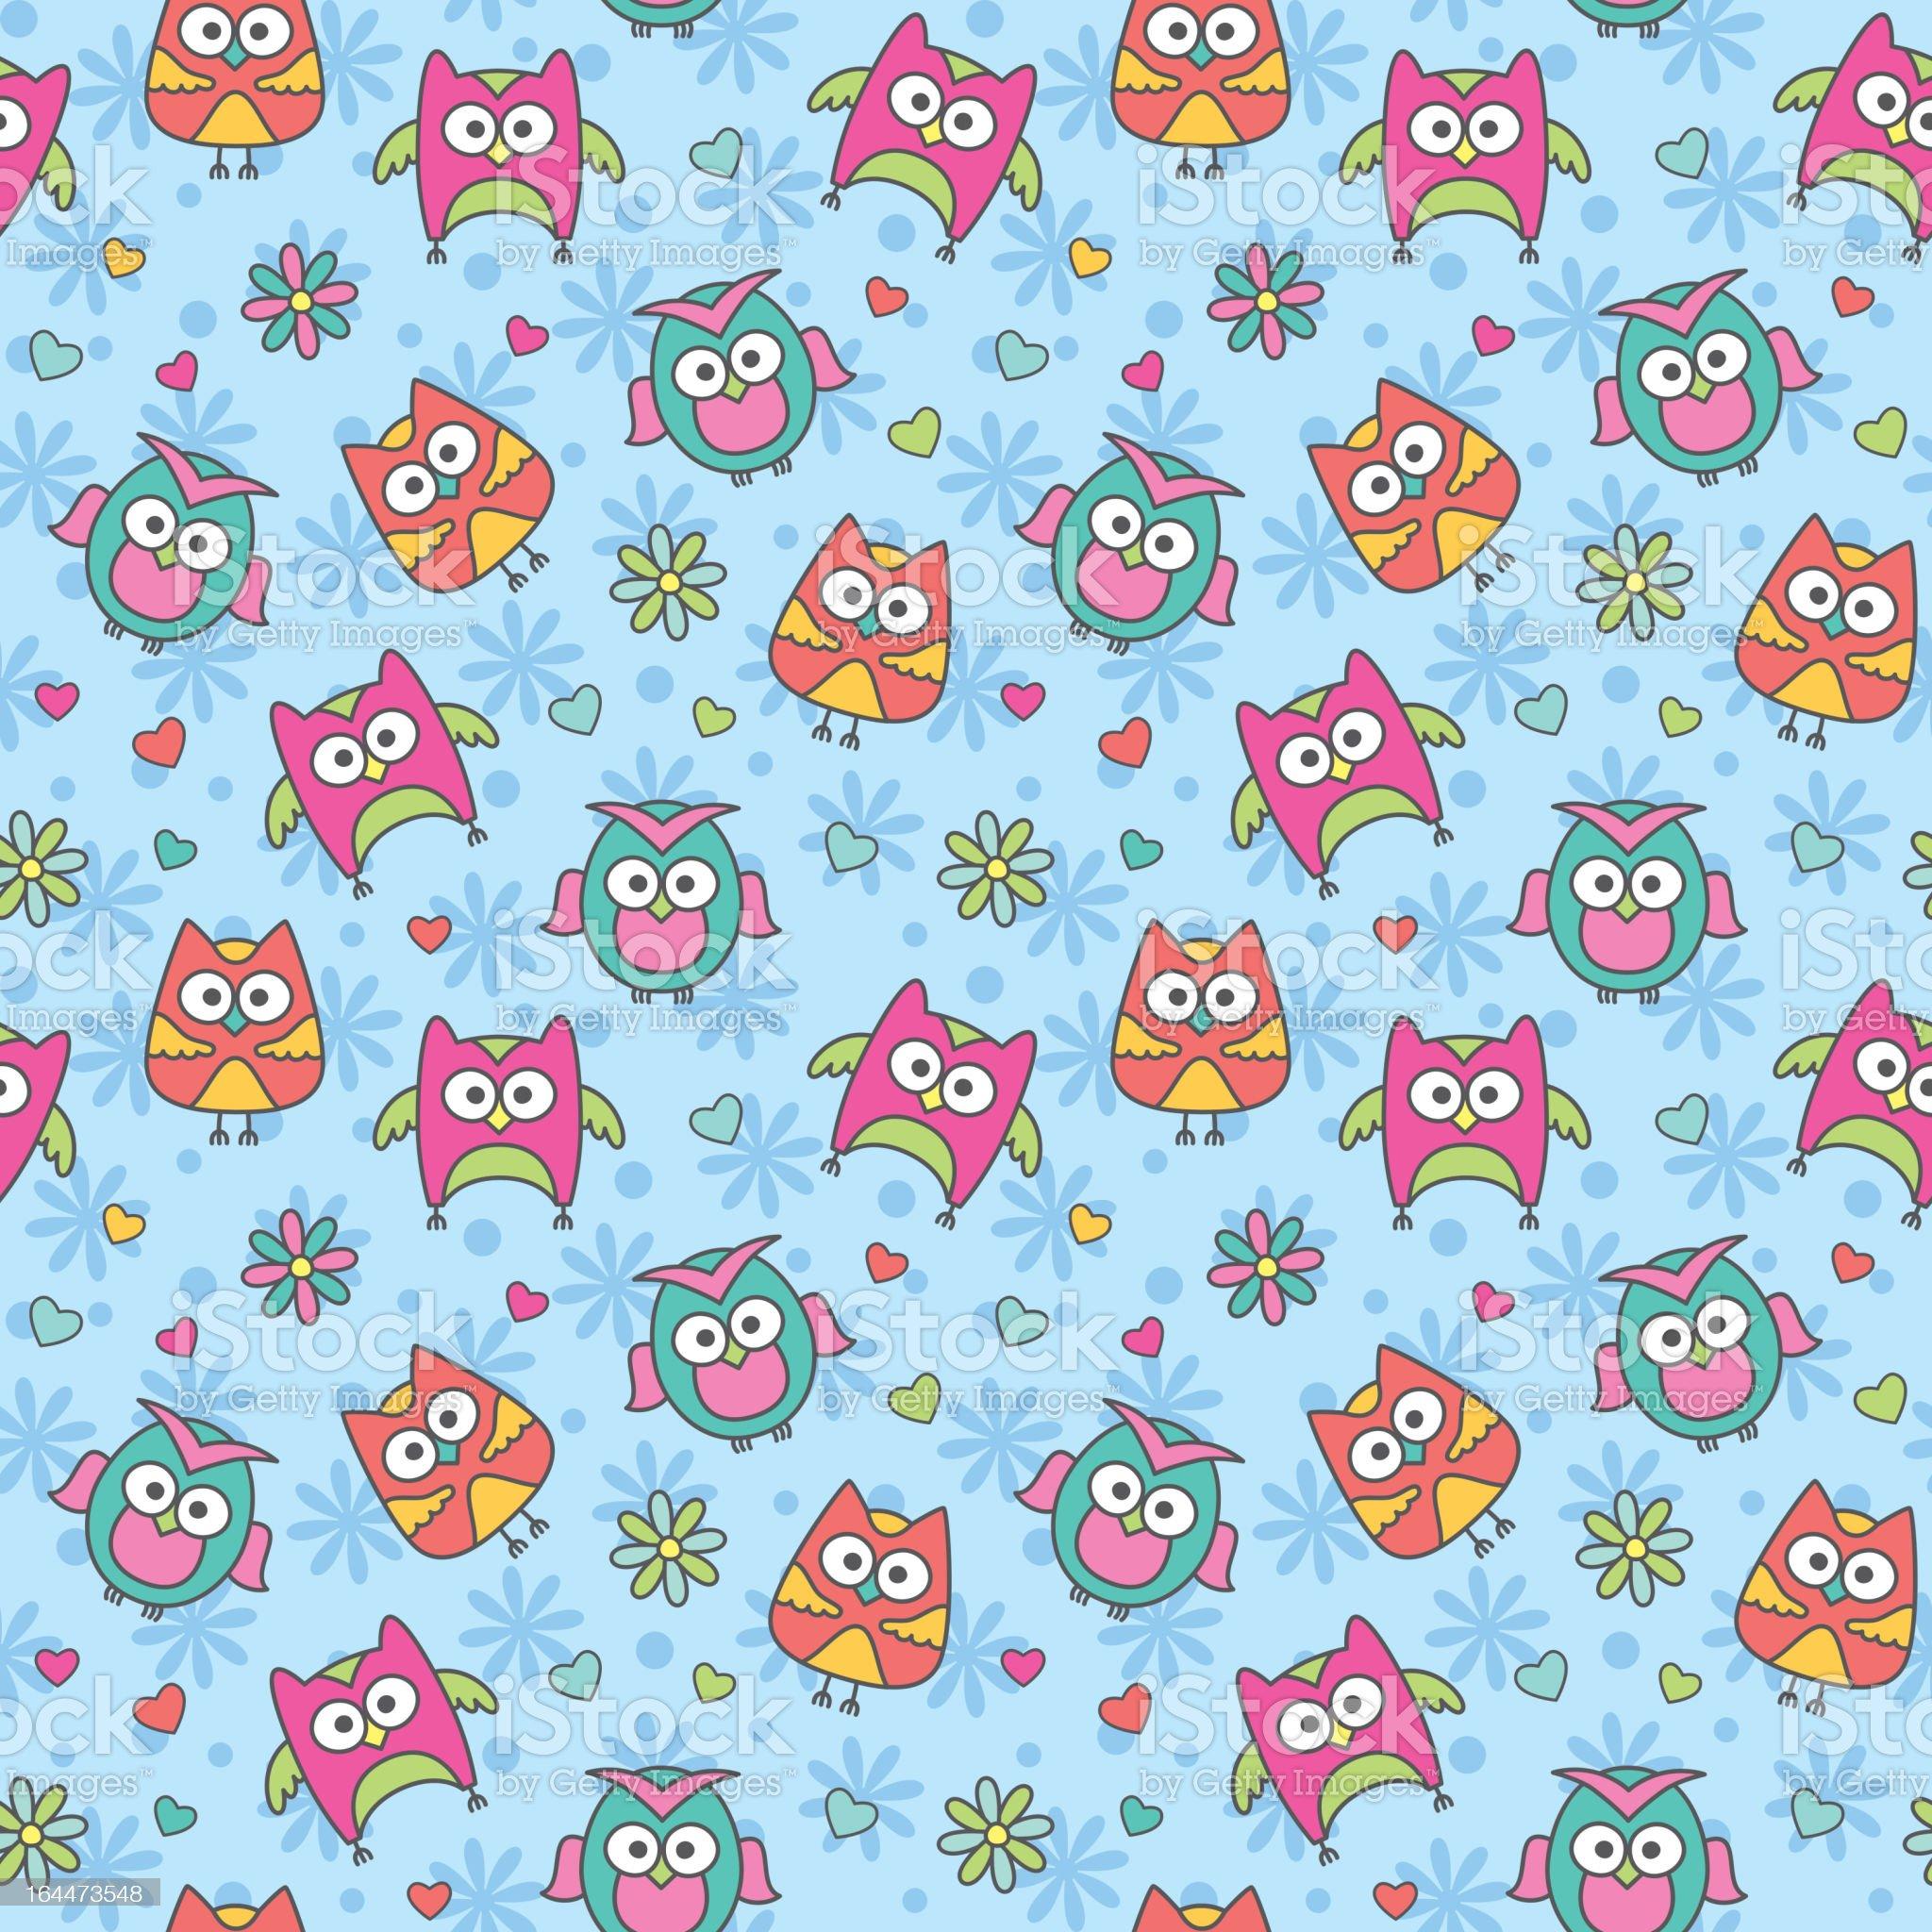 pattern of cartoon owls royalty-free stock vector art